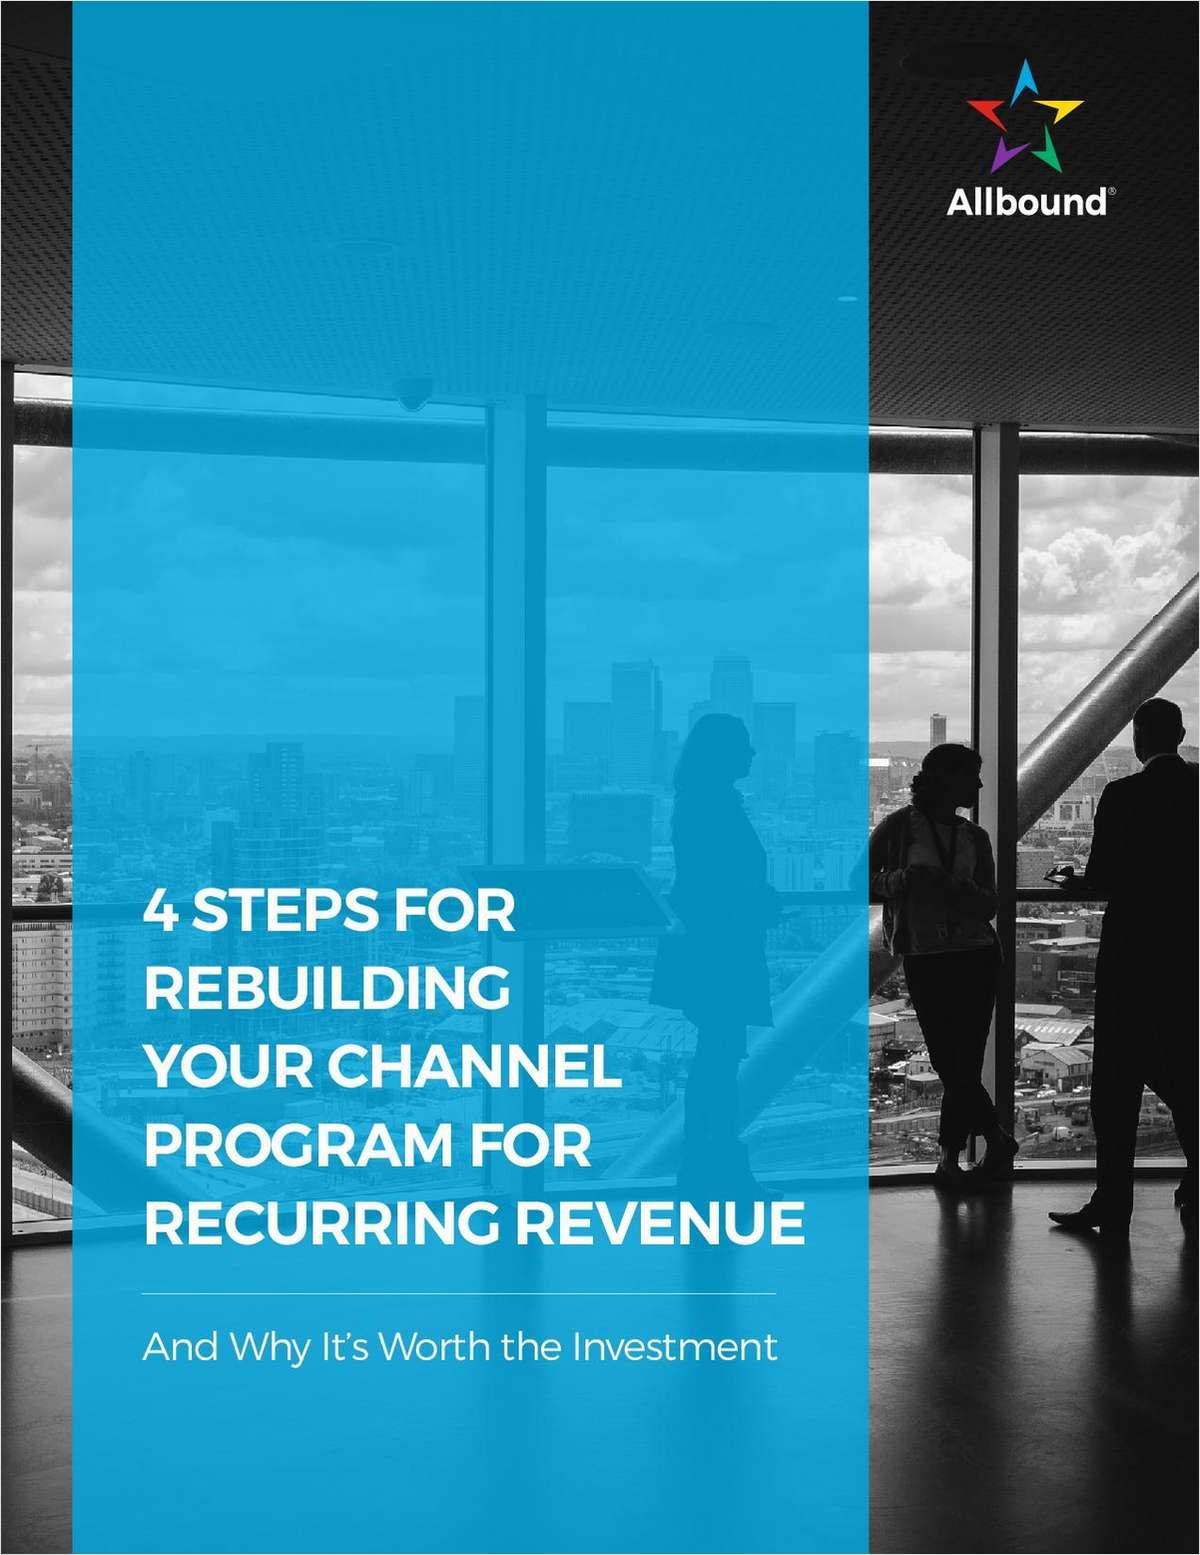 4 Steps for Rebuilding Your Channel Program for Recurring Revenue